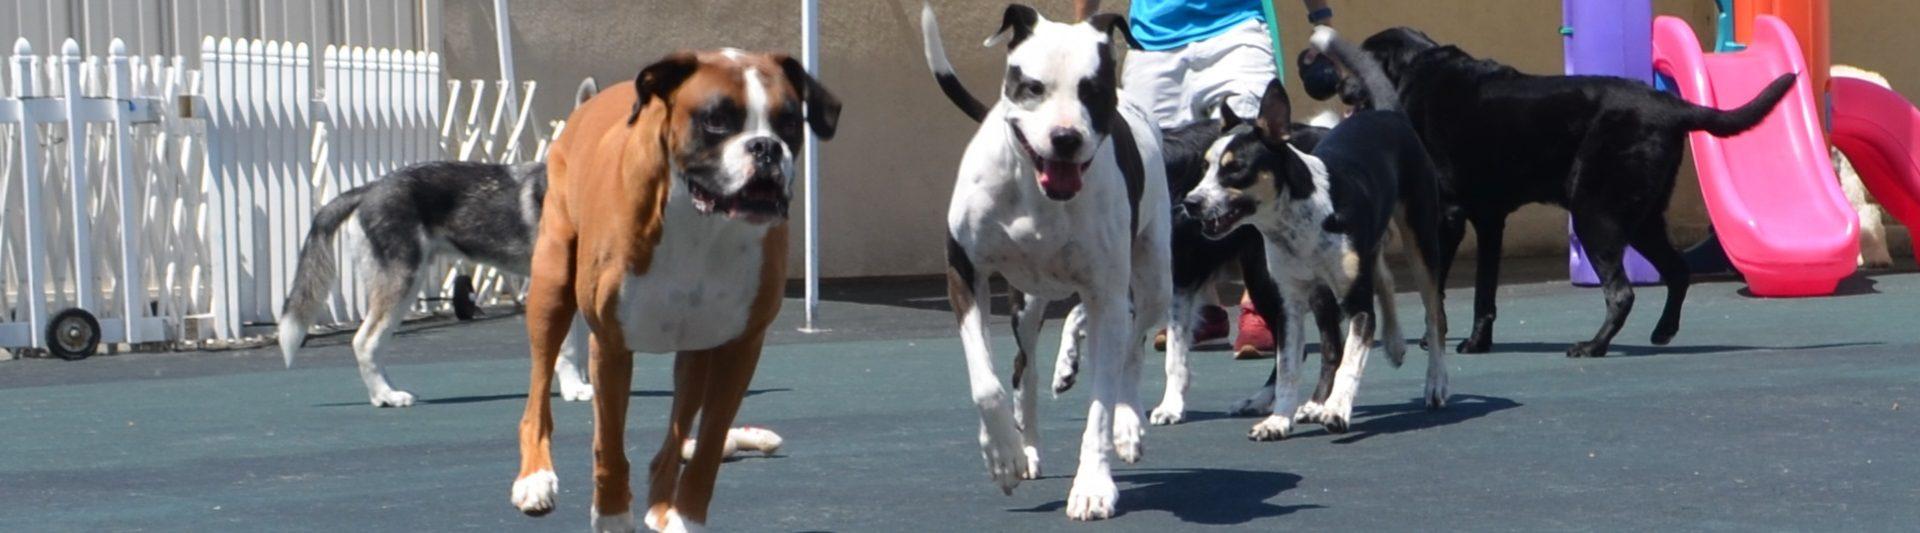 Orange County Dog Training, Daycare, & Boarding | Wags & Wiggles